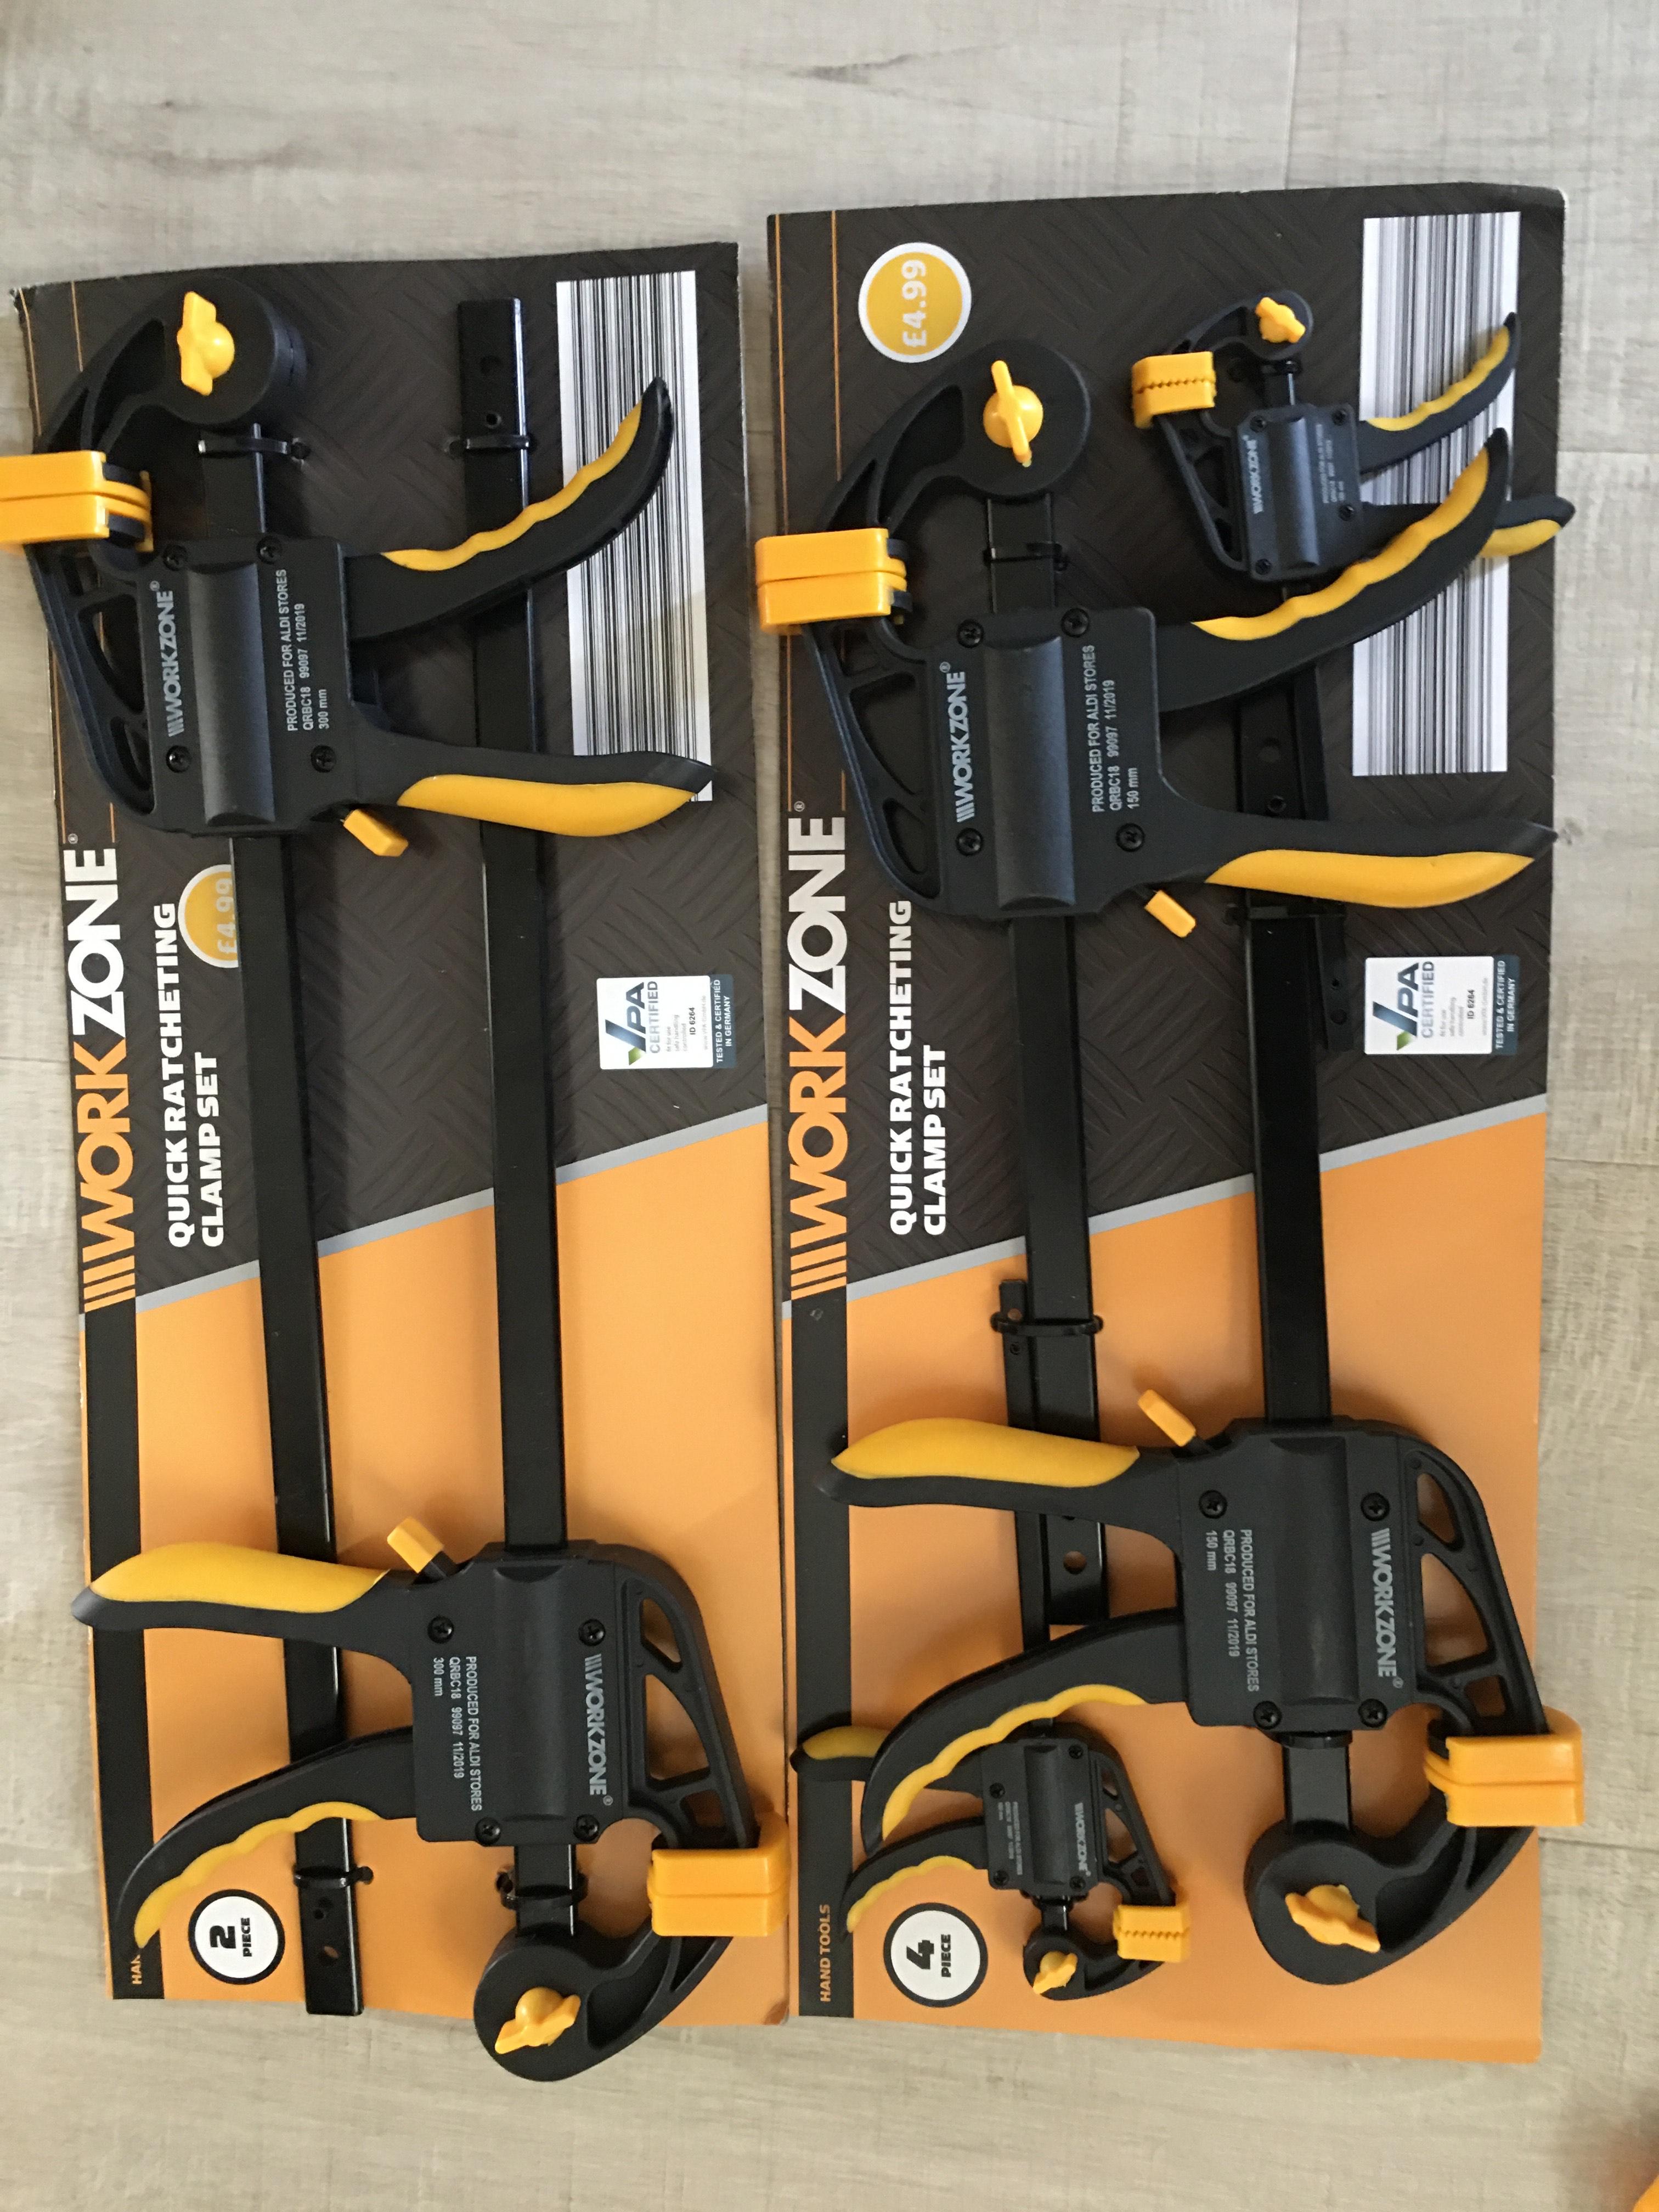 Work zone quick ratcheting clamp set £4.99 instore @ Aldi Milton Keynes